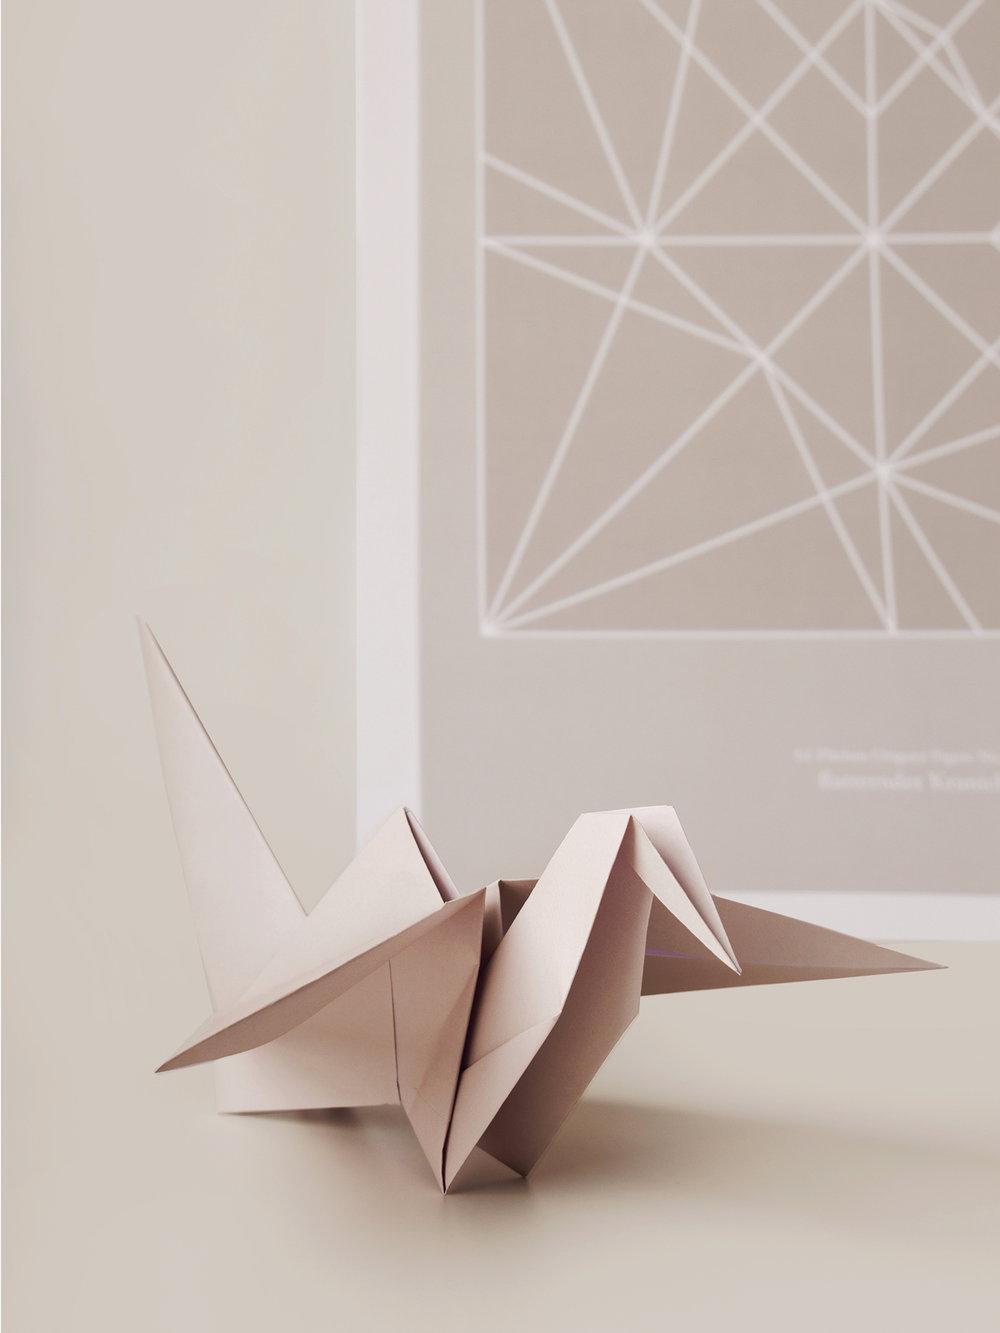 Origami Figur Kranich mit passendem Print  Origami figure Crane with adequate print